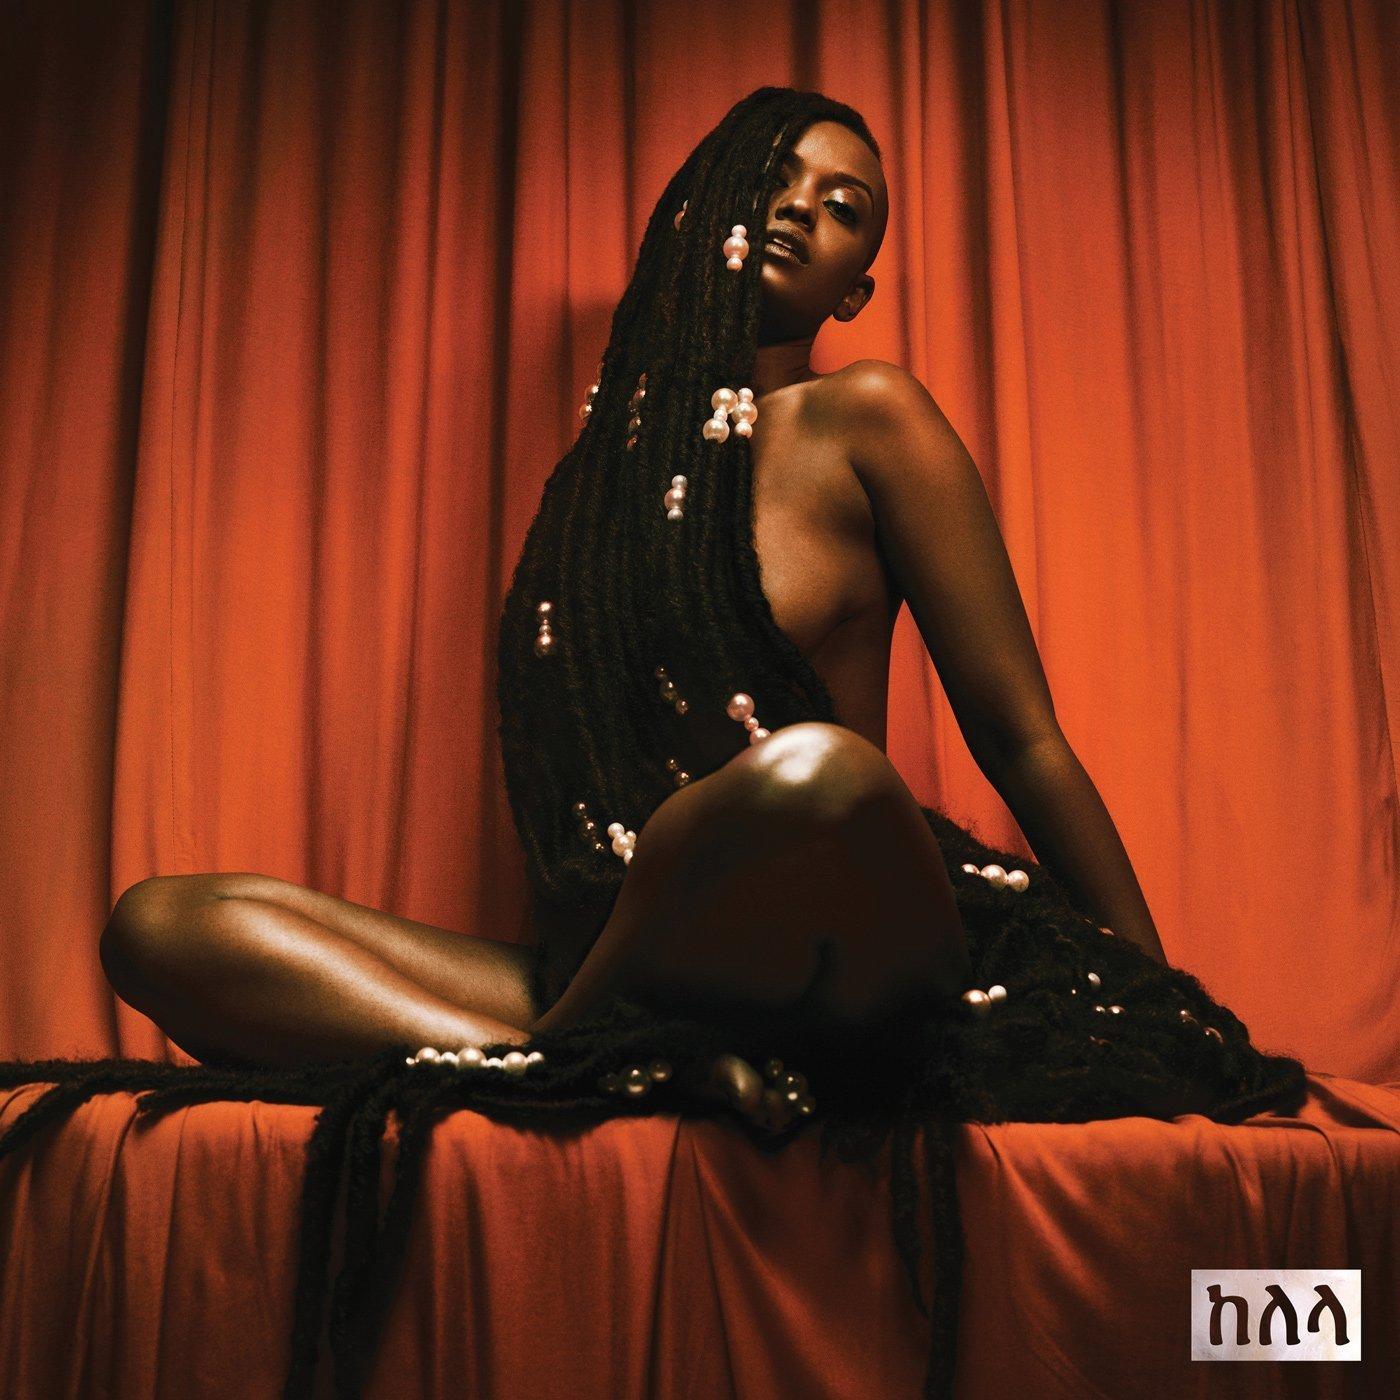 kelela take me apart stream album download Kelela reveals debut album Take Me Apart: Stream/download